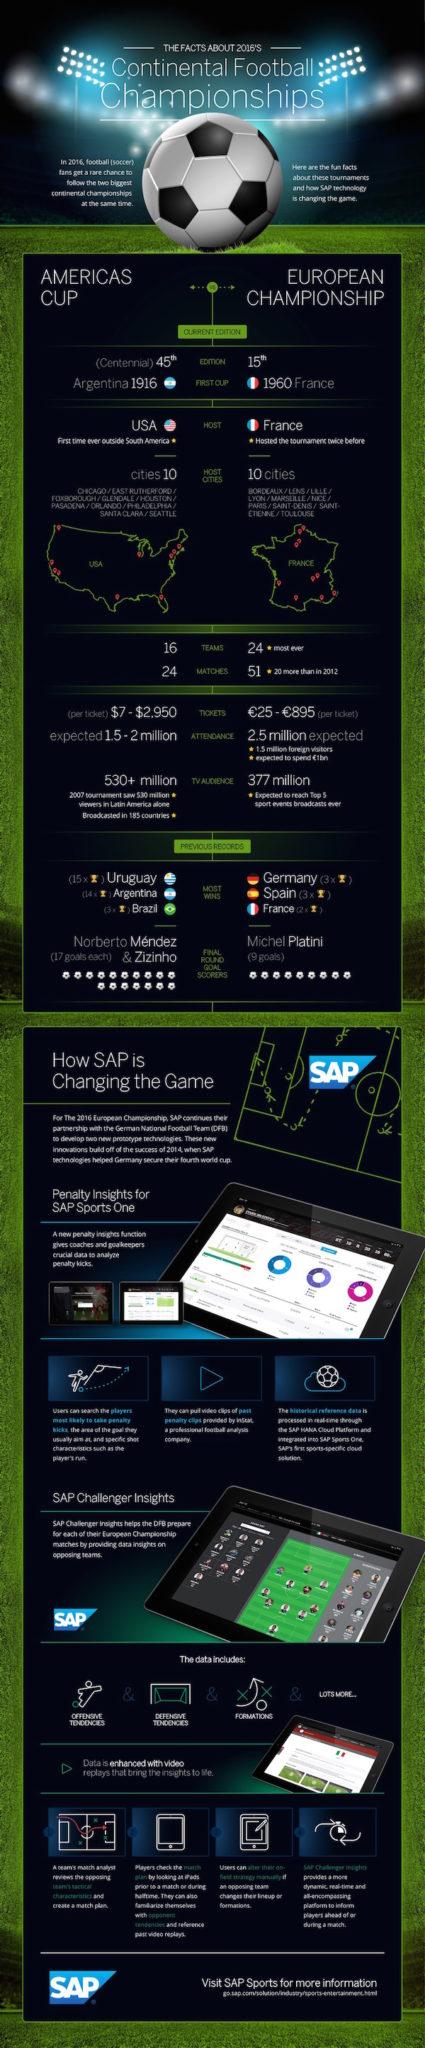 SAP infographic final 02 600 soccer